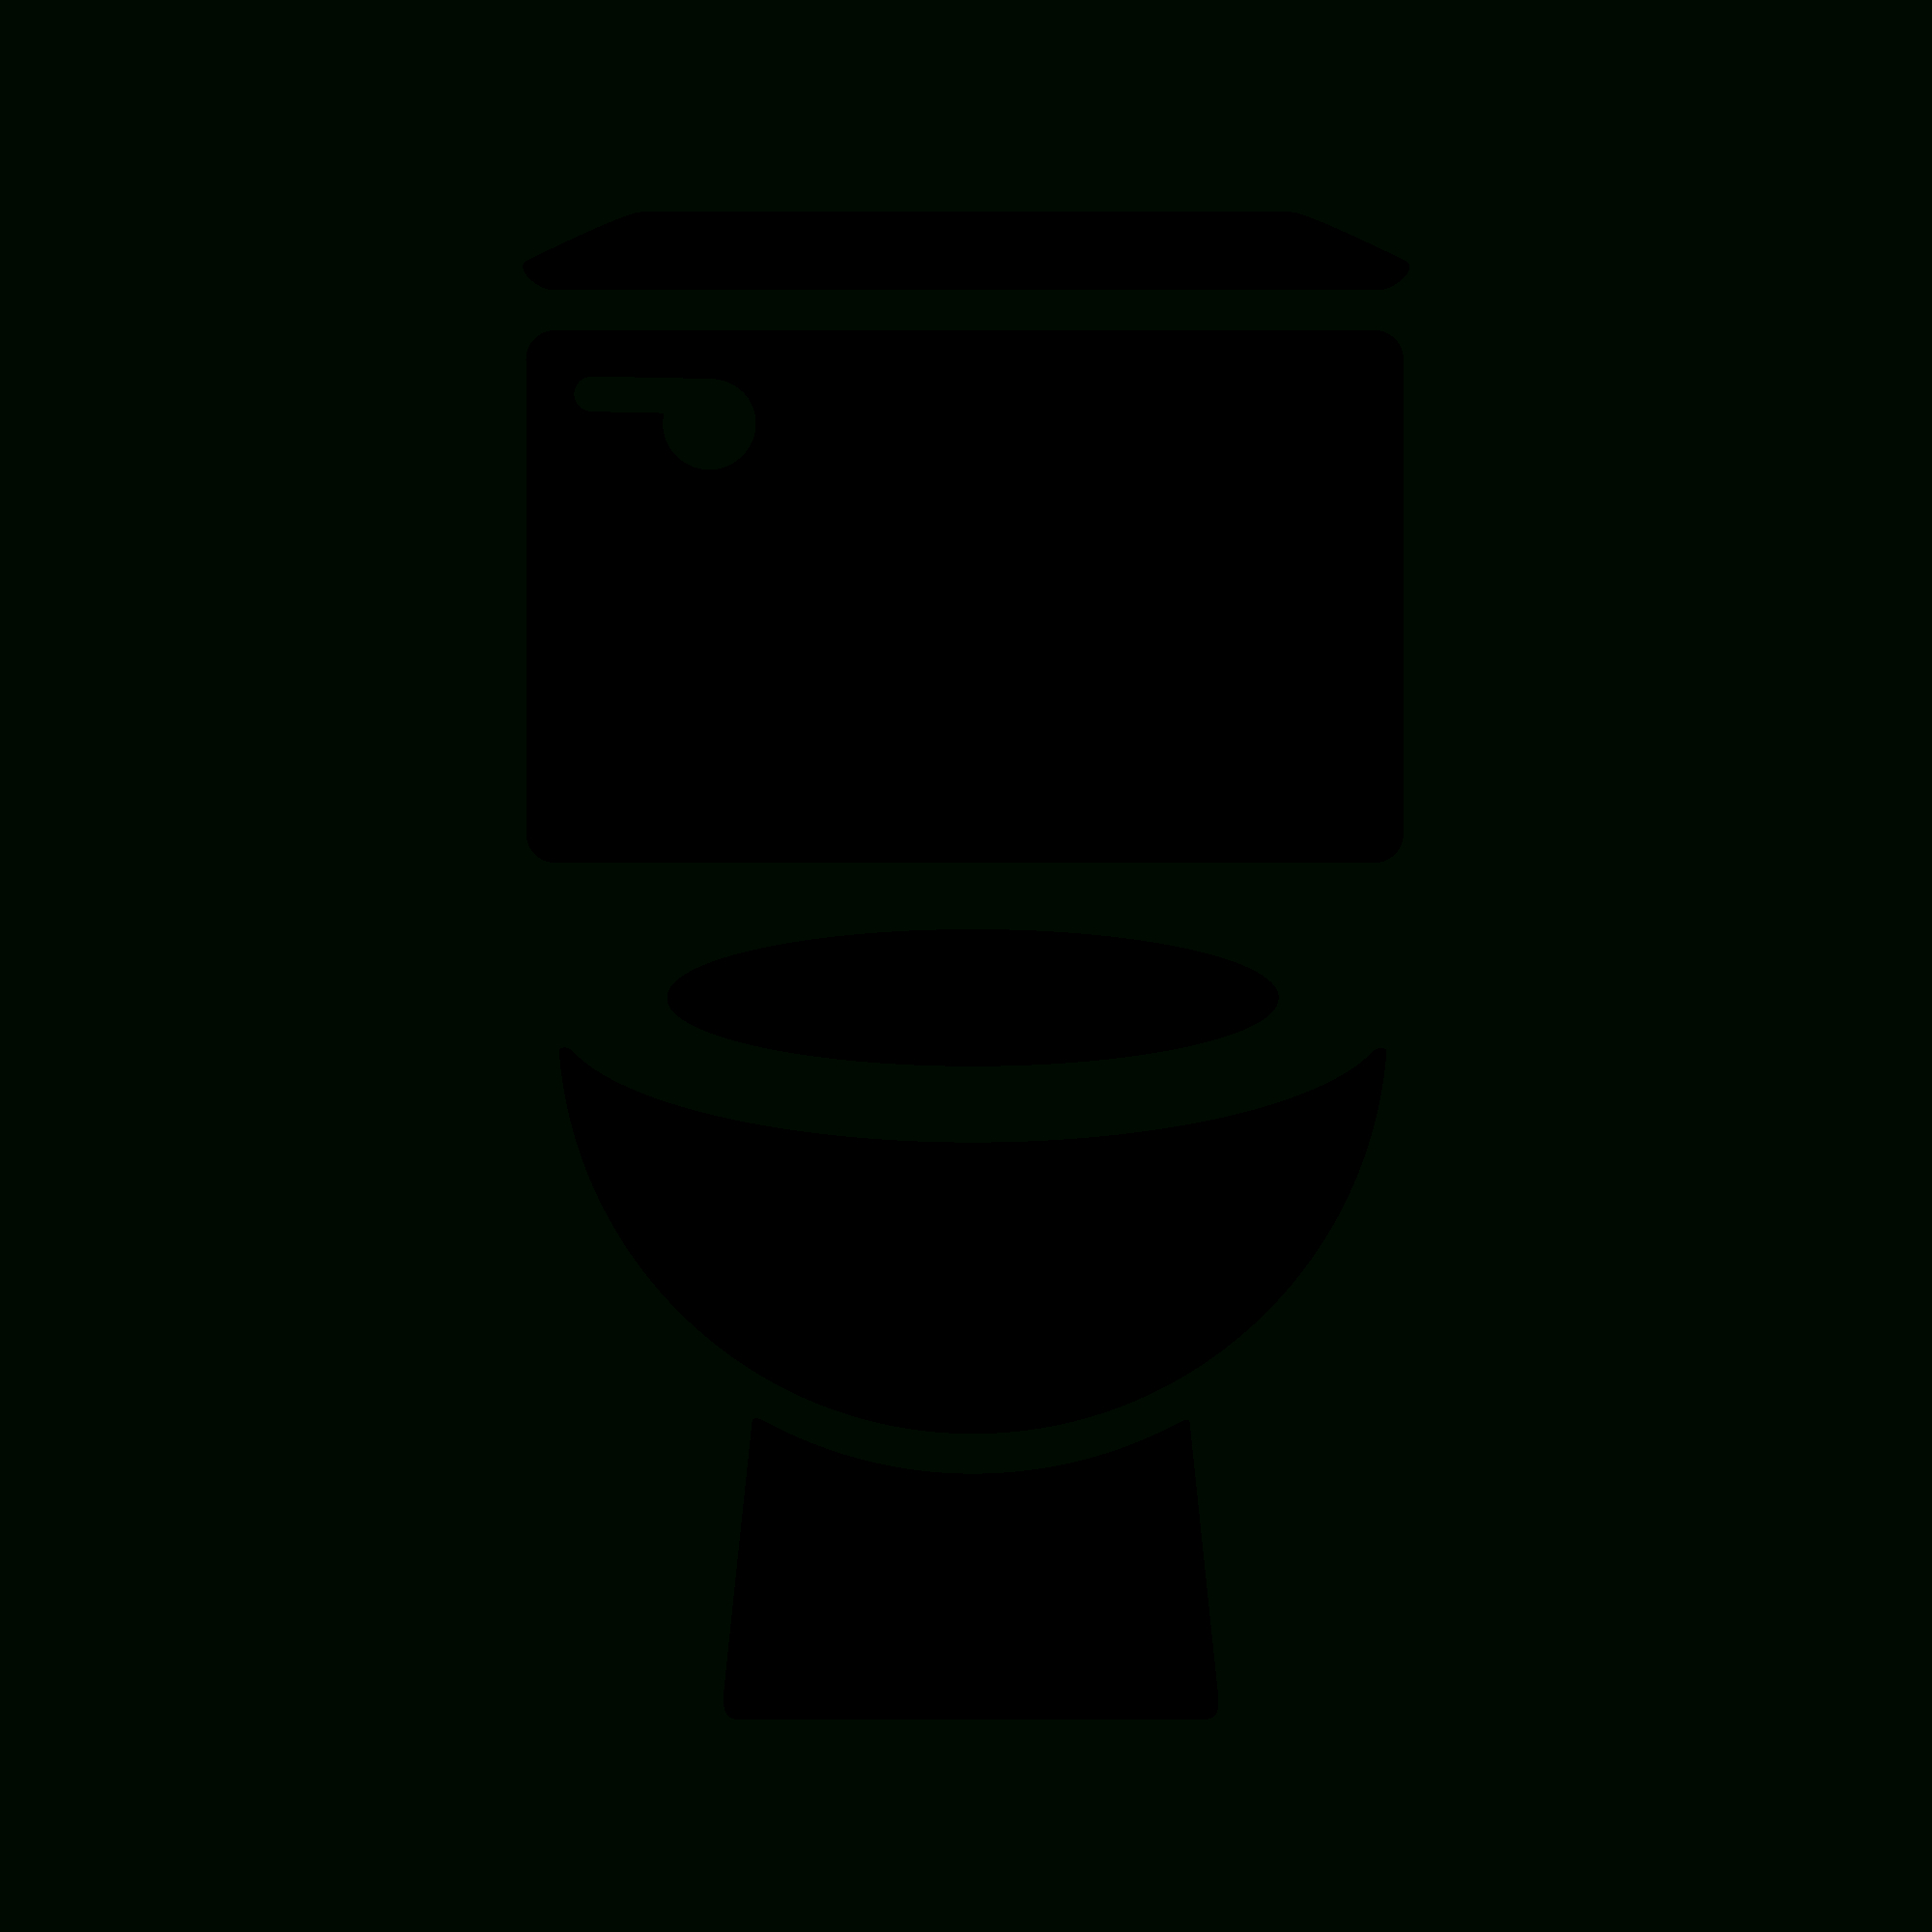 Free Printable Restroom Signs, Download Free Clip Art, Free Clip Art - Free Printable Flush The Toilet Signs